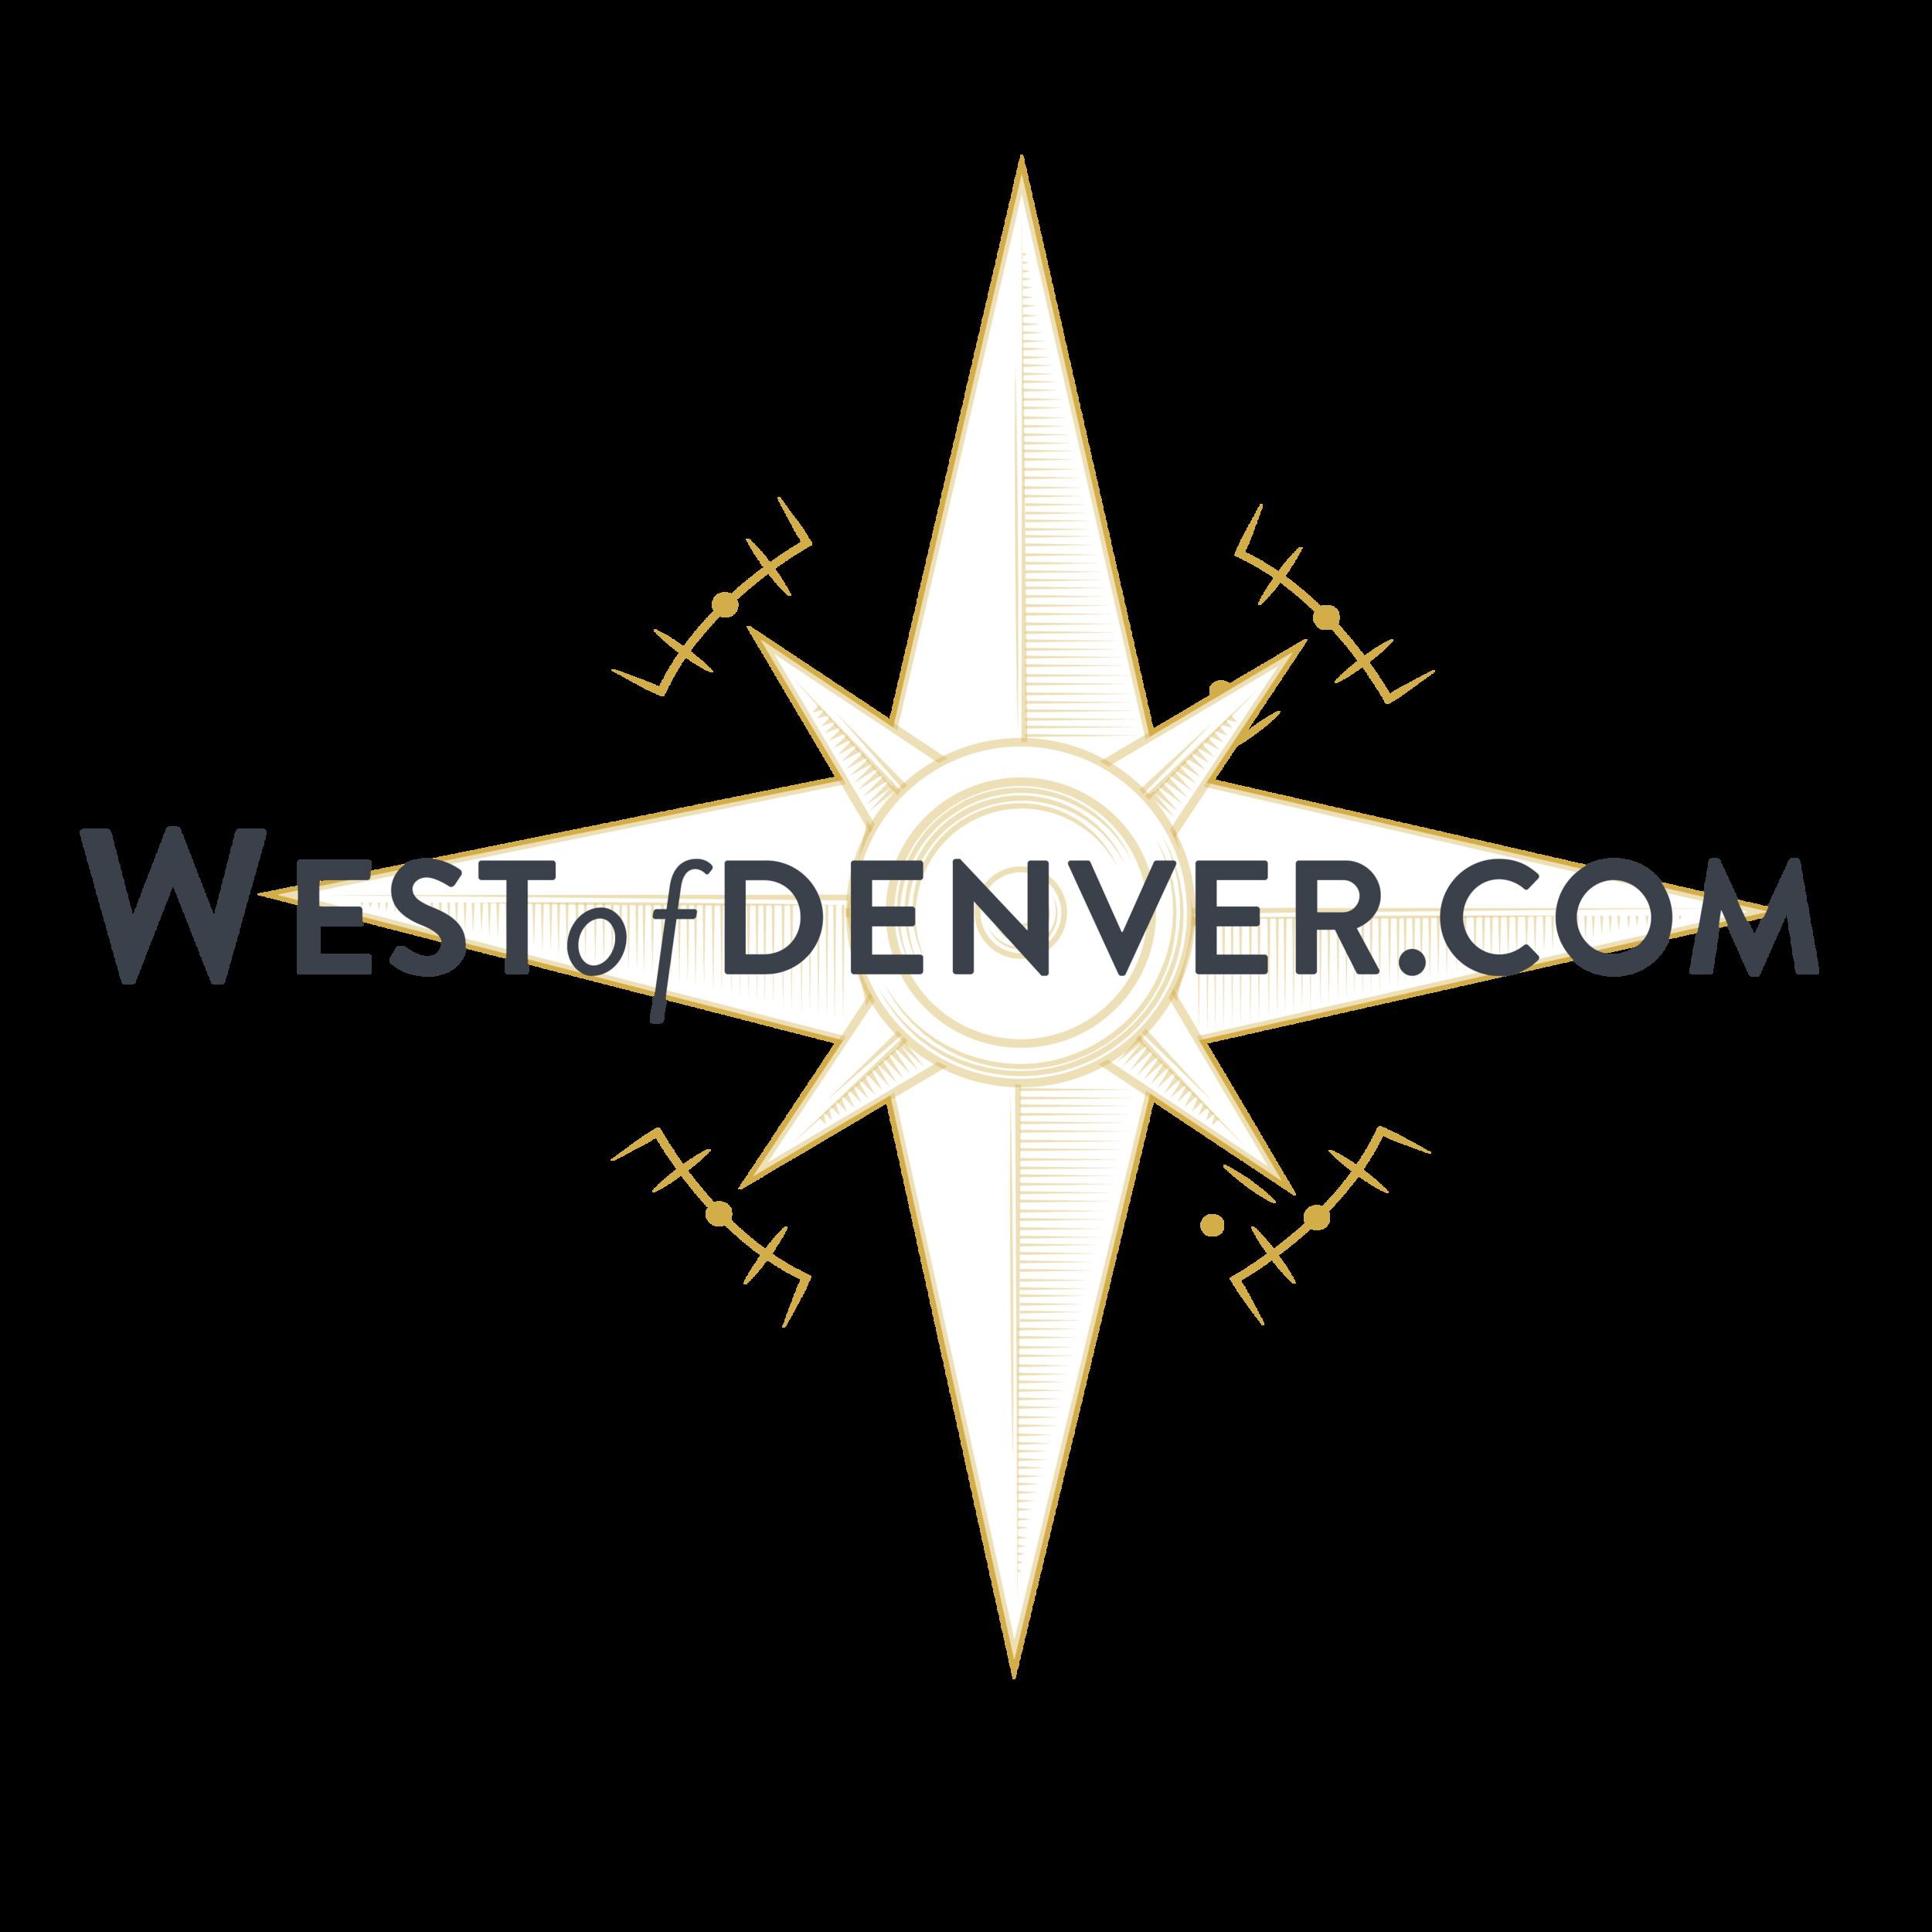 westofdenver-Logo-01.png